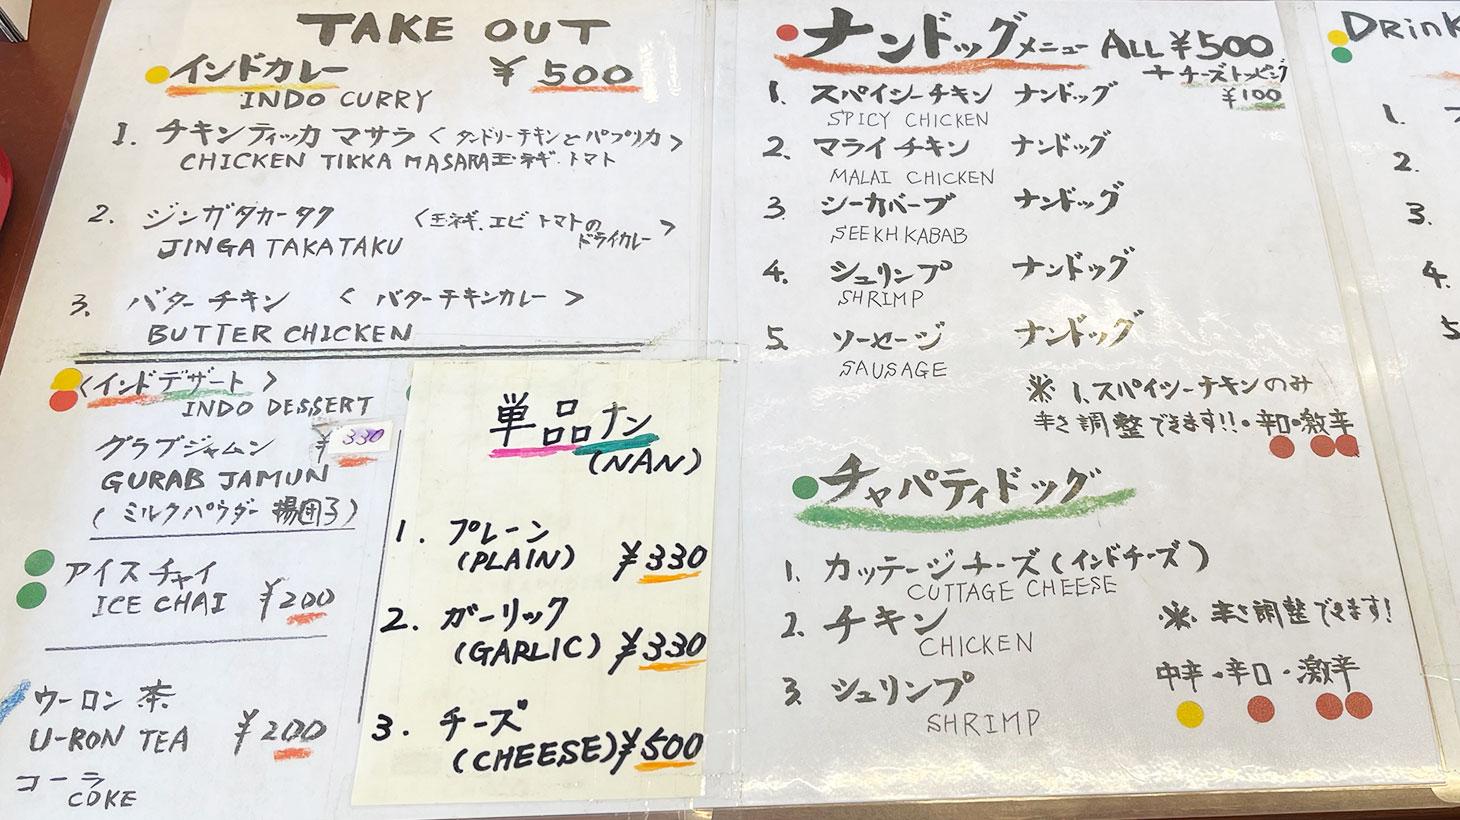 TANDOORI NIPPONフード・テイクアウトメニュー